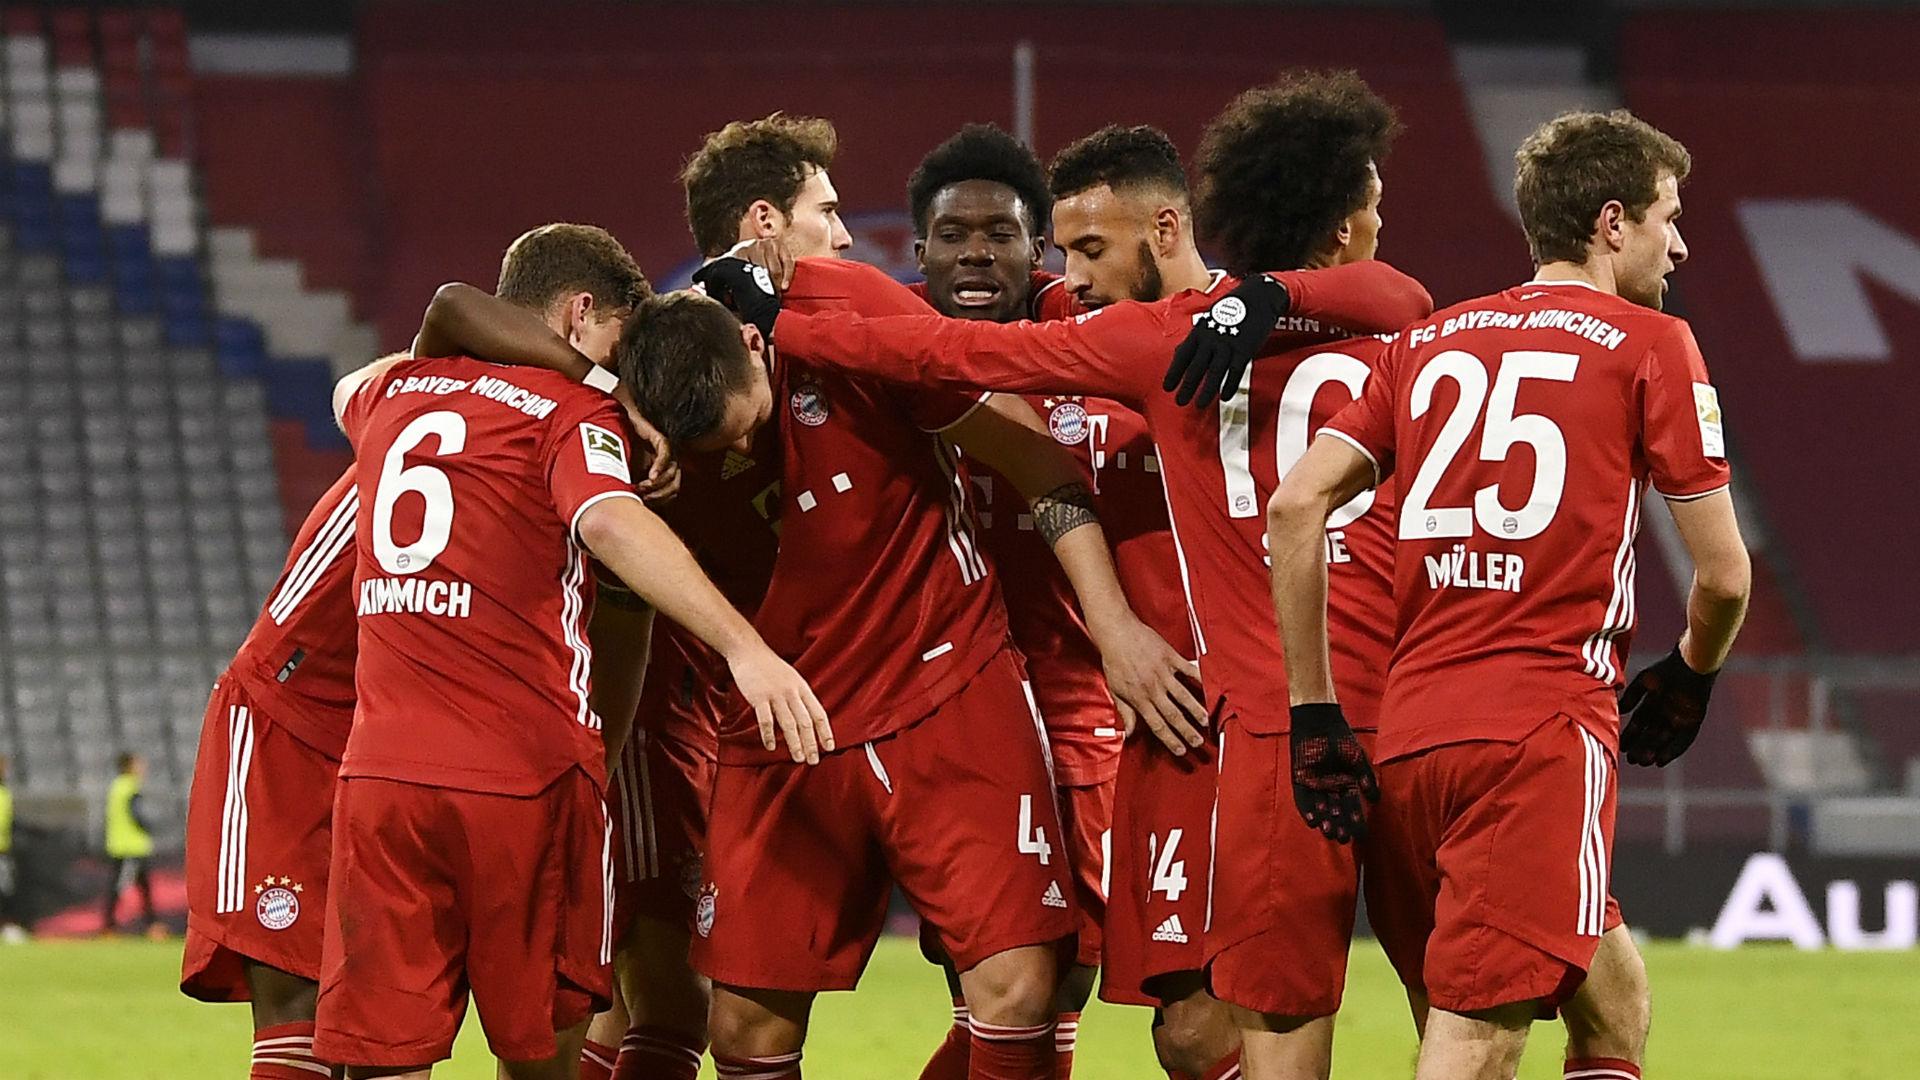 Bayern Munich 5-2 Mainz: Flick's comeback kings strike again